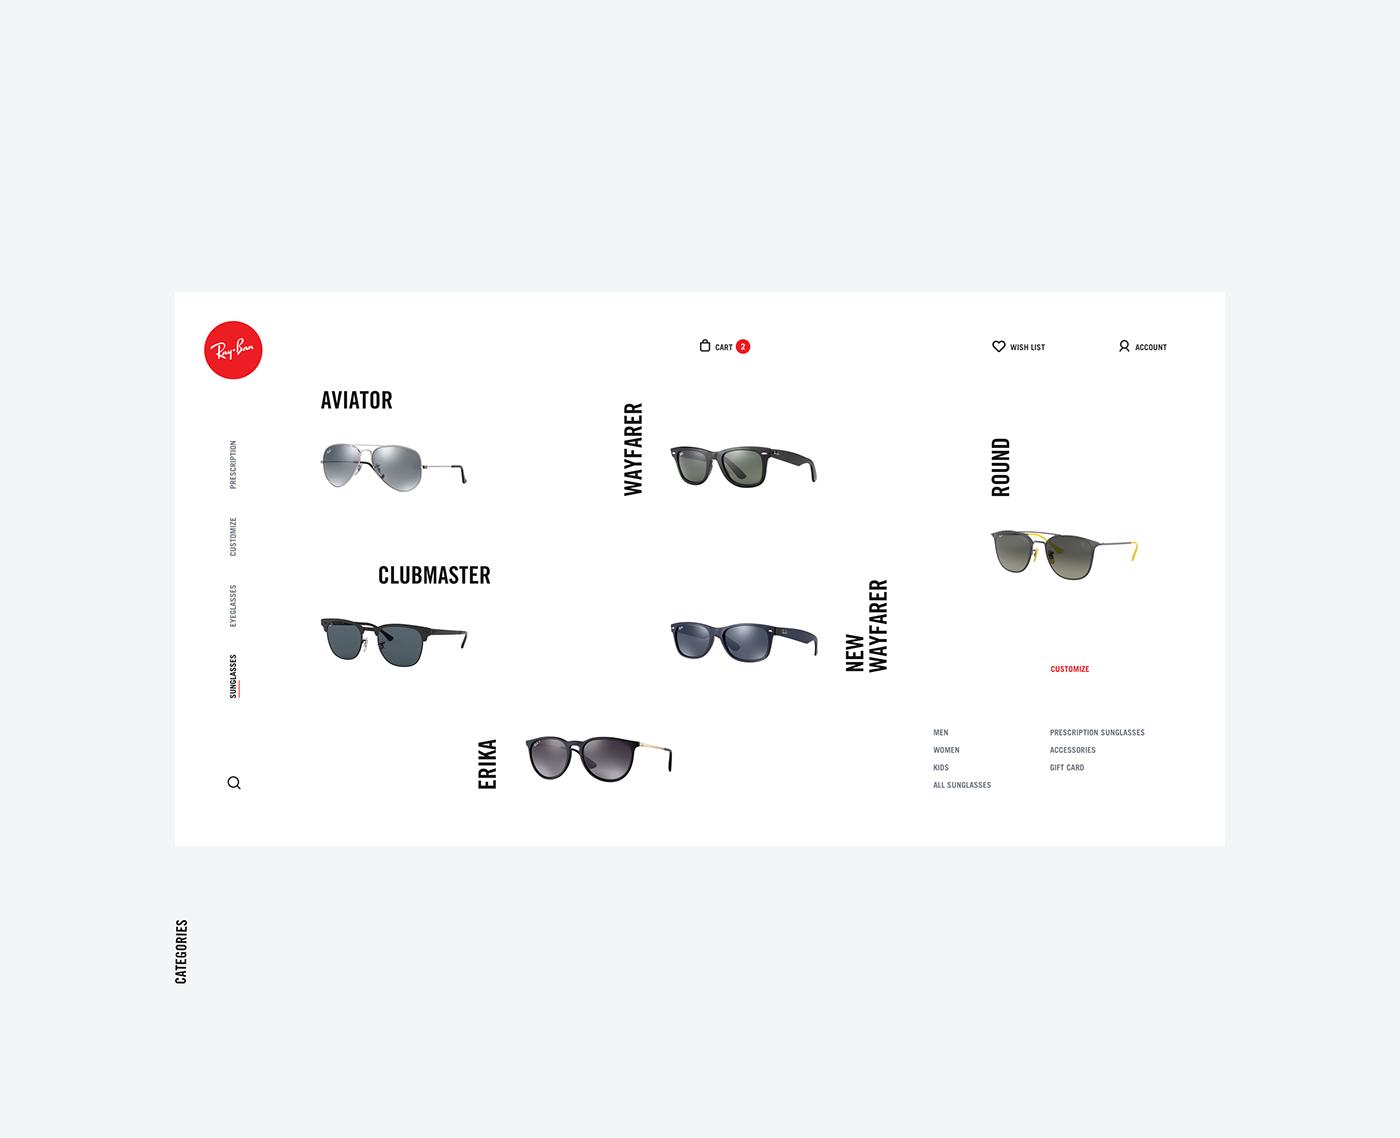 雷朋(Ray-Ban)眼镜概念网页设计